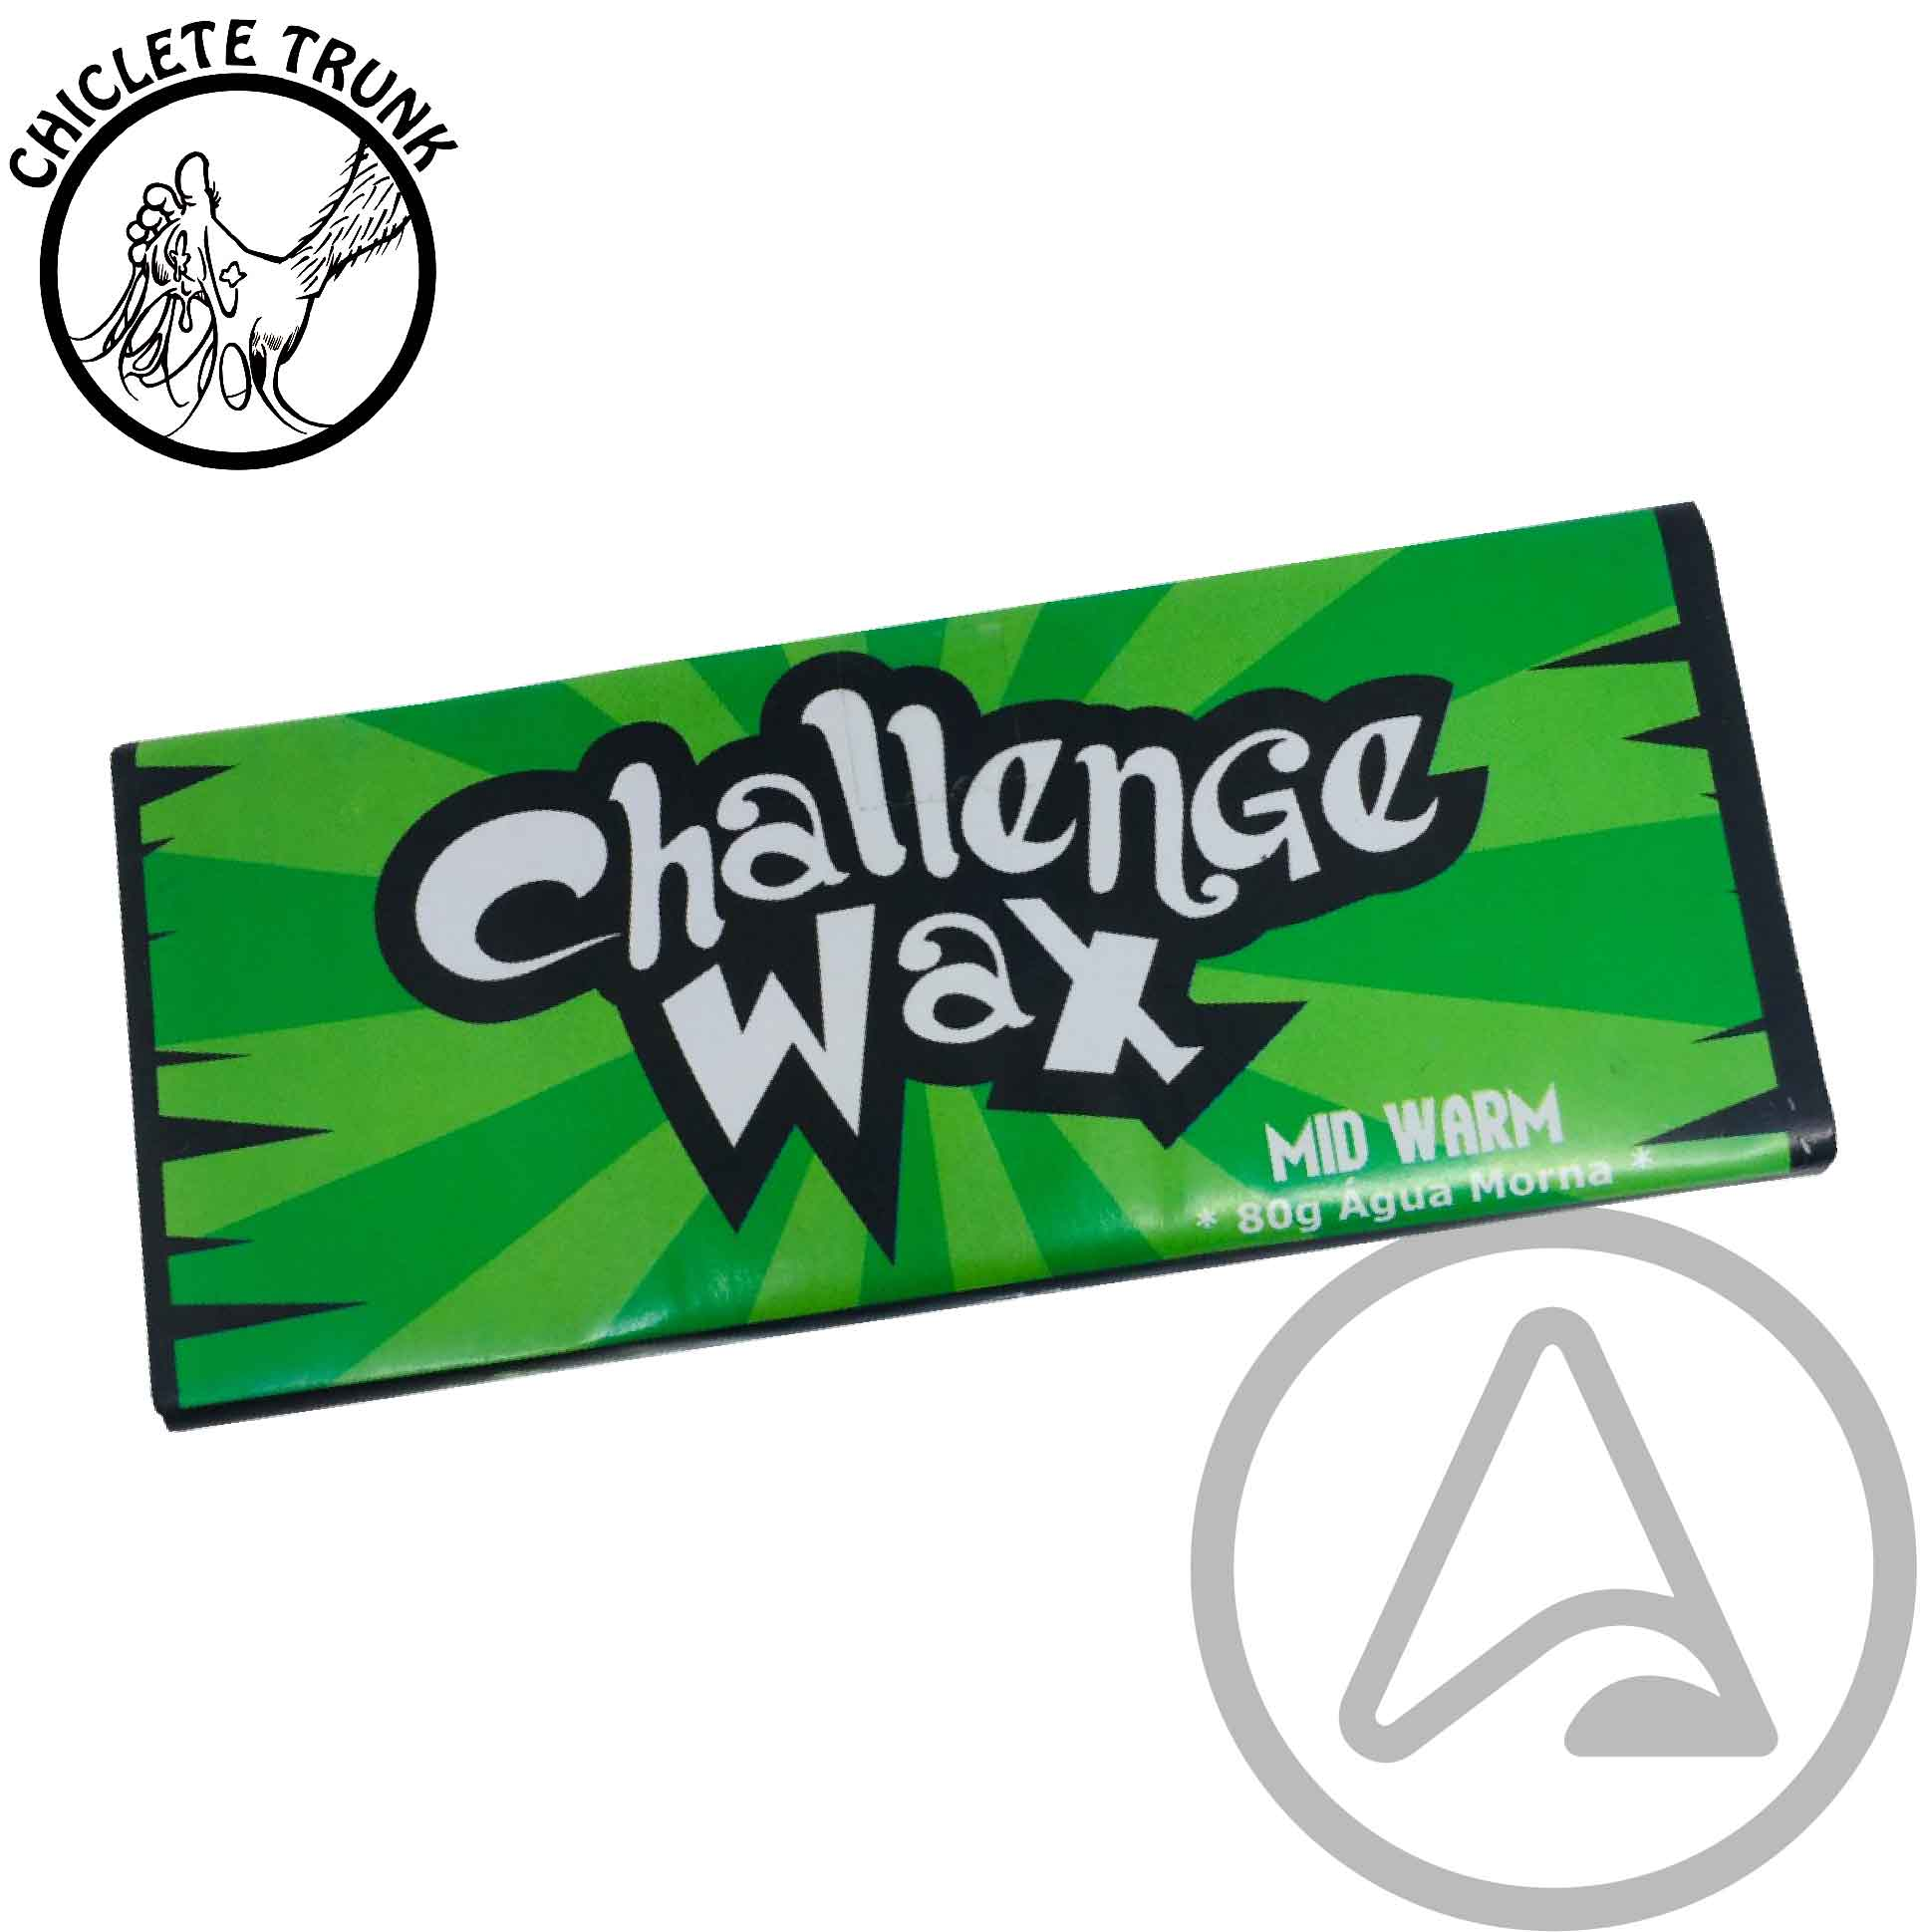 Kit Parafinas CTWax Challenge Wax  80g - 10 Unidades